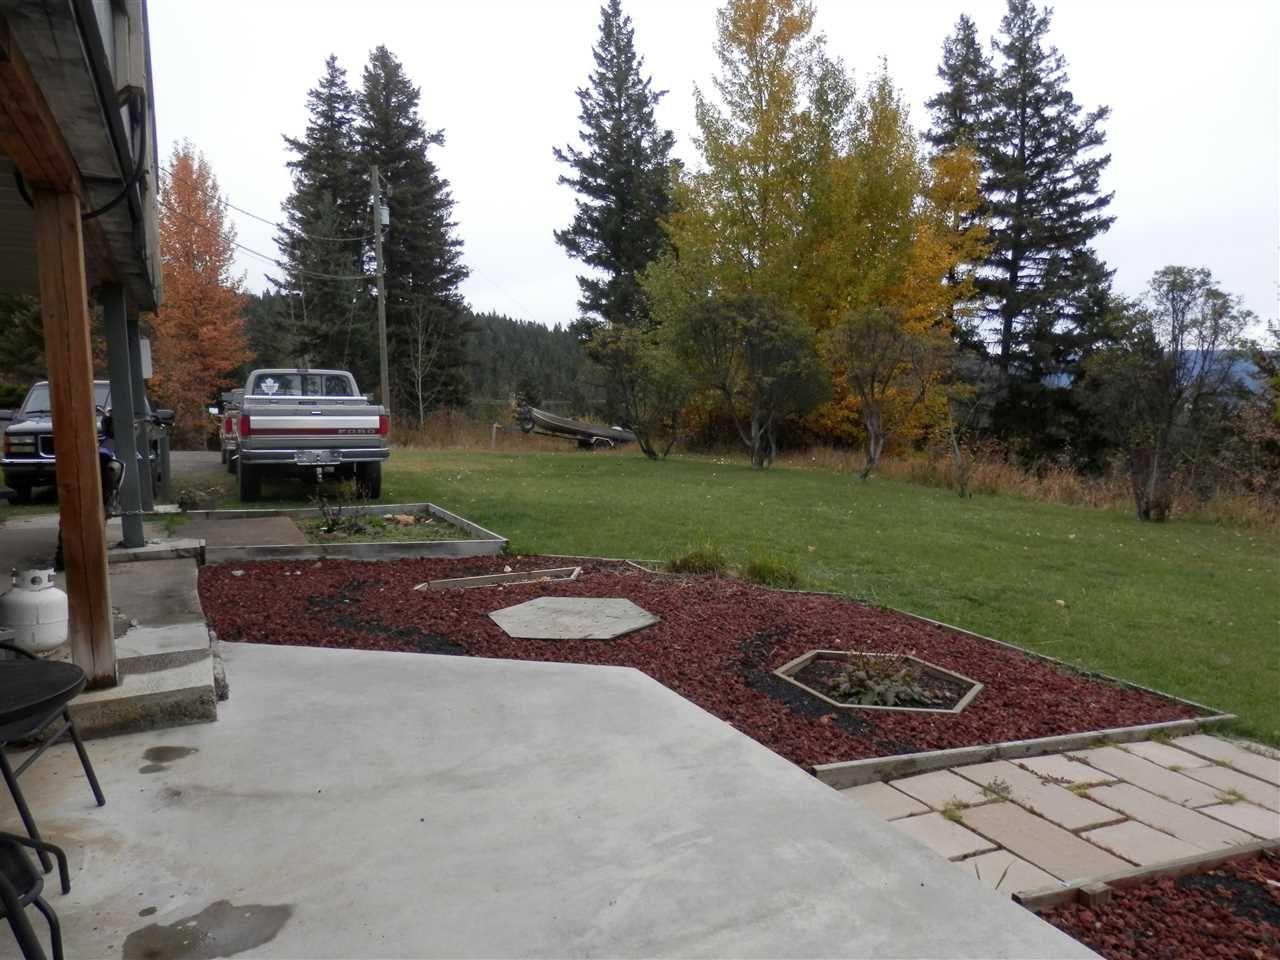 Photo 20: Photos: 935 HODGSON Road in Williams Lake: Esler/Dog Creek House for sale (Williams Lake (Zone 27))  : MLS®# R2414109